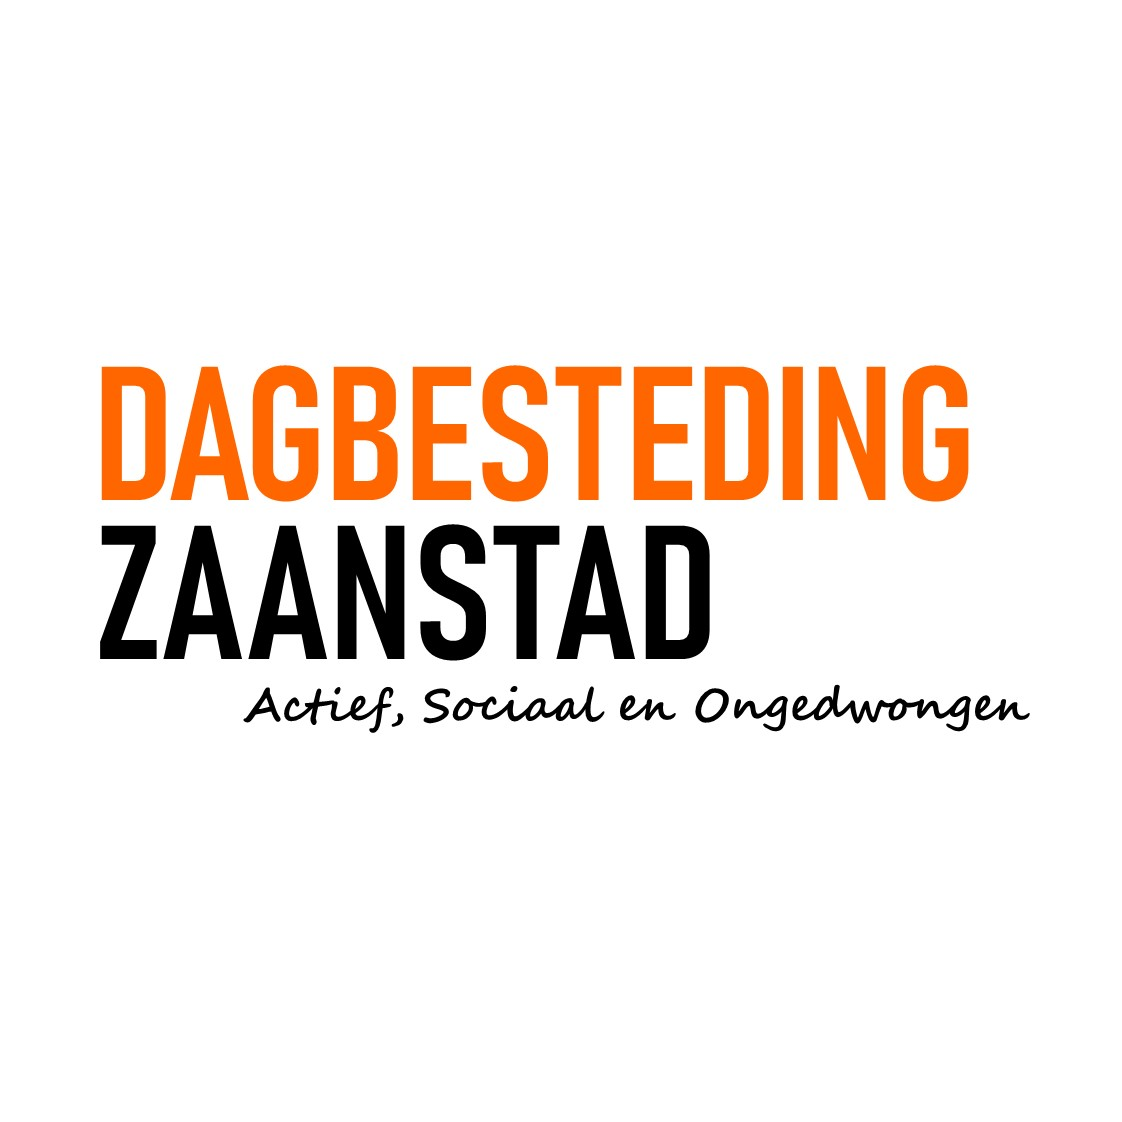 Dagbesteding Zaanstad